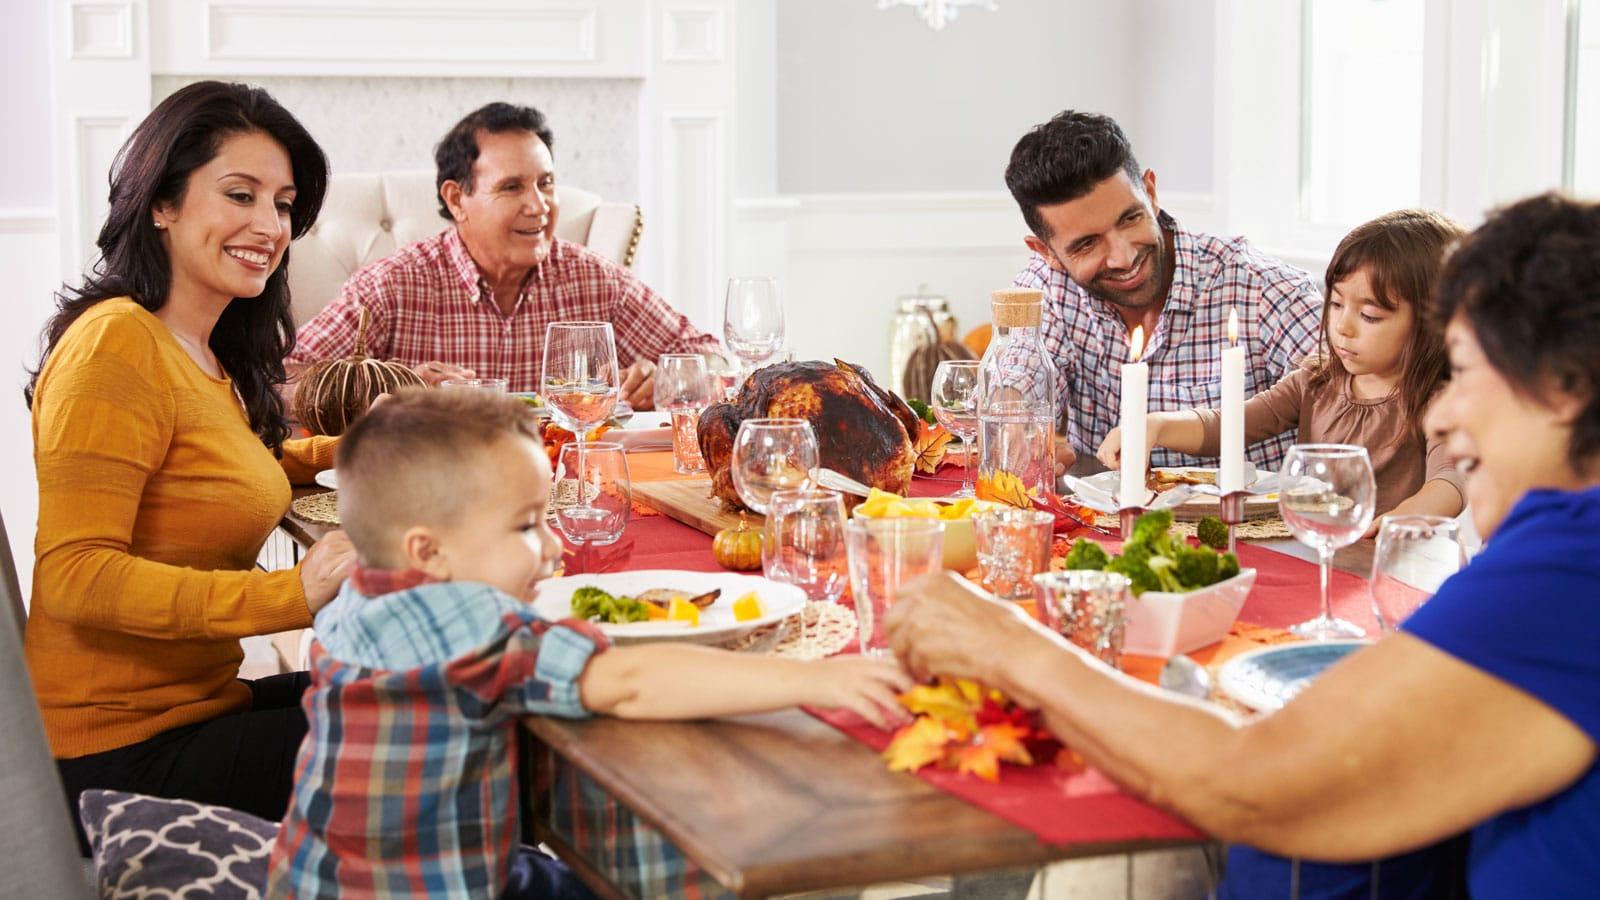 Enjoy an allergy-friendly Thanksgiving